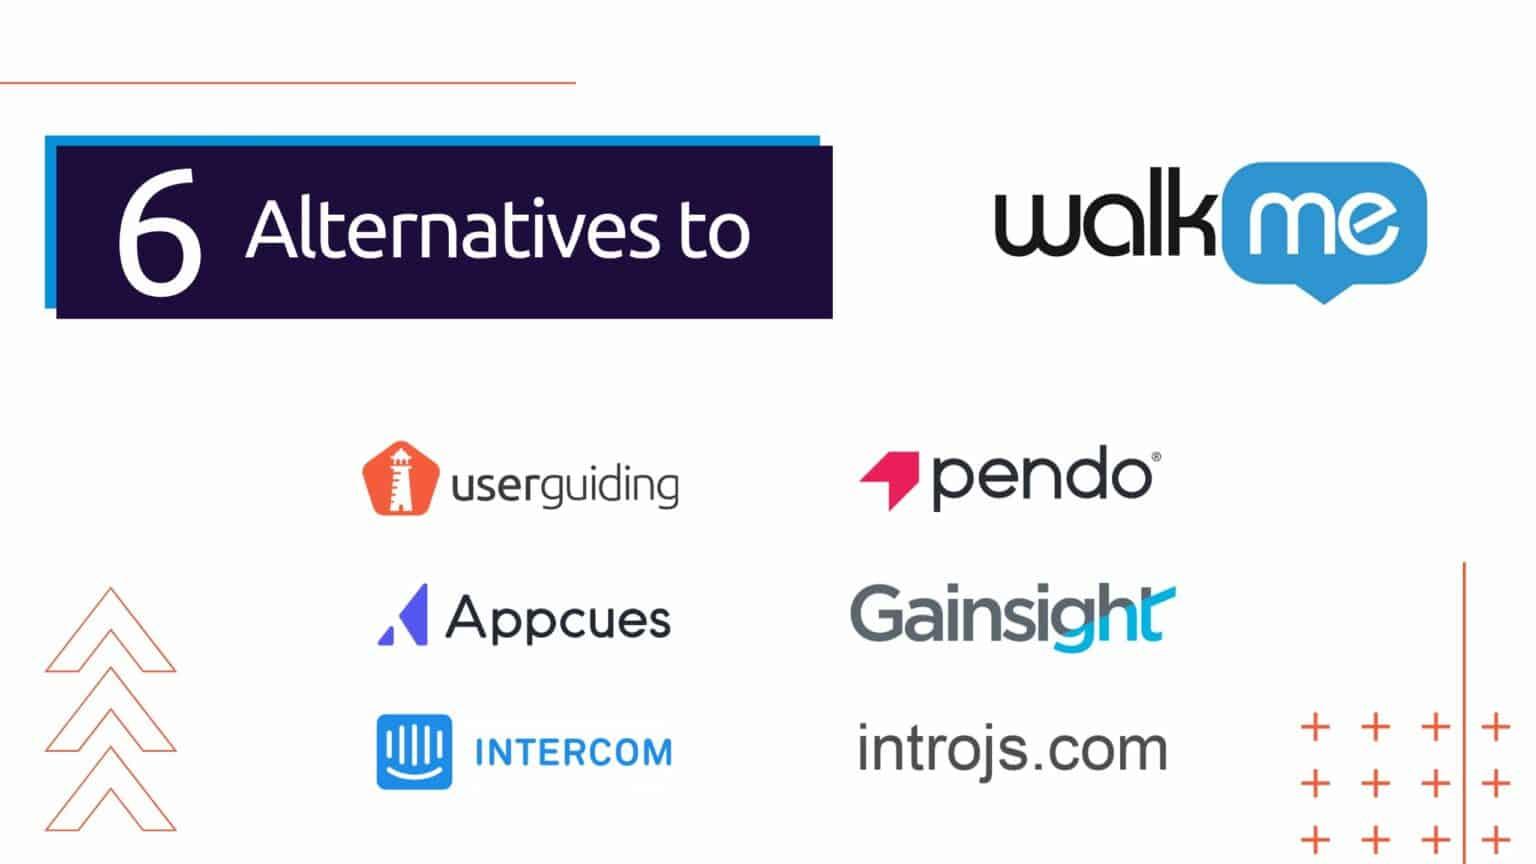 Alternativas e Competidores da WalkMe